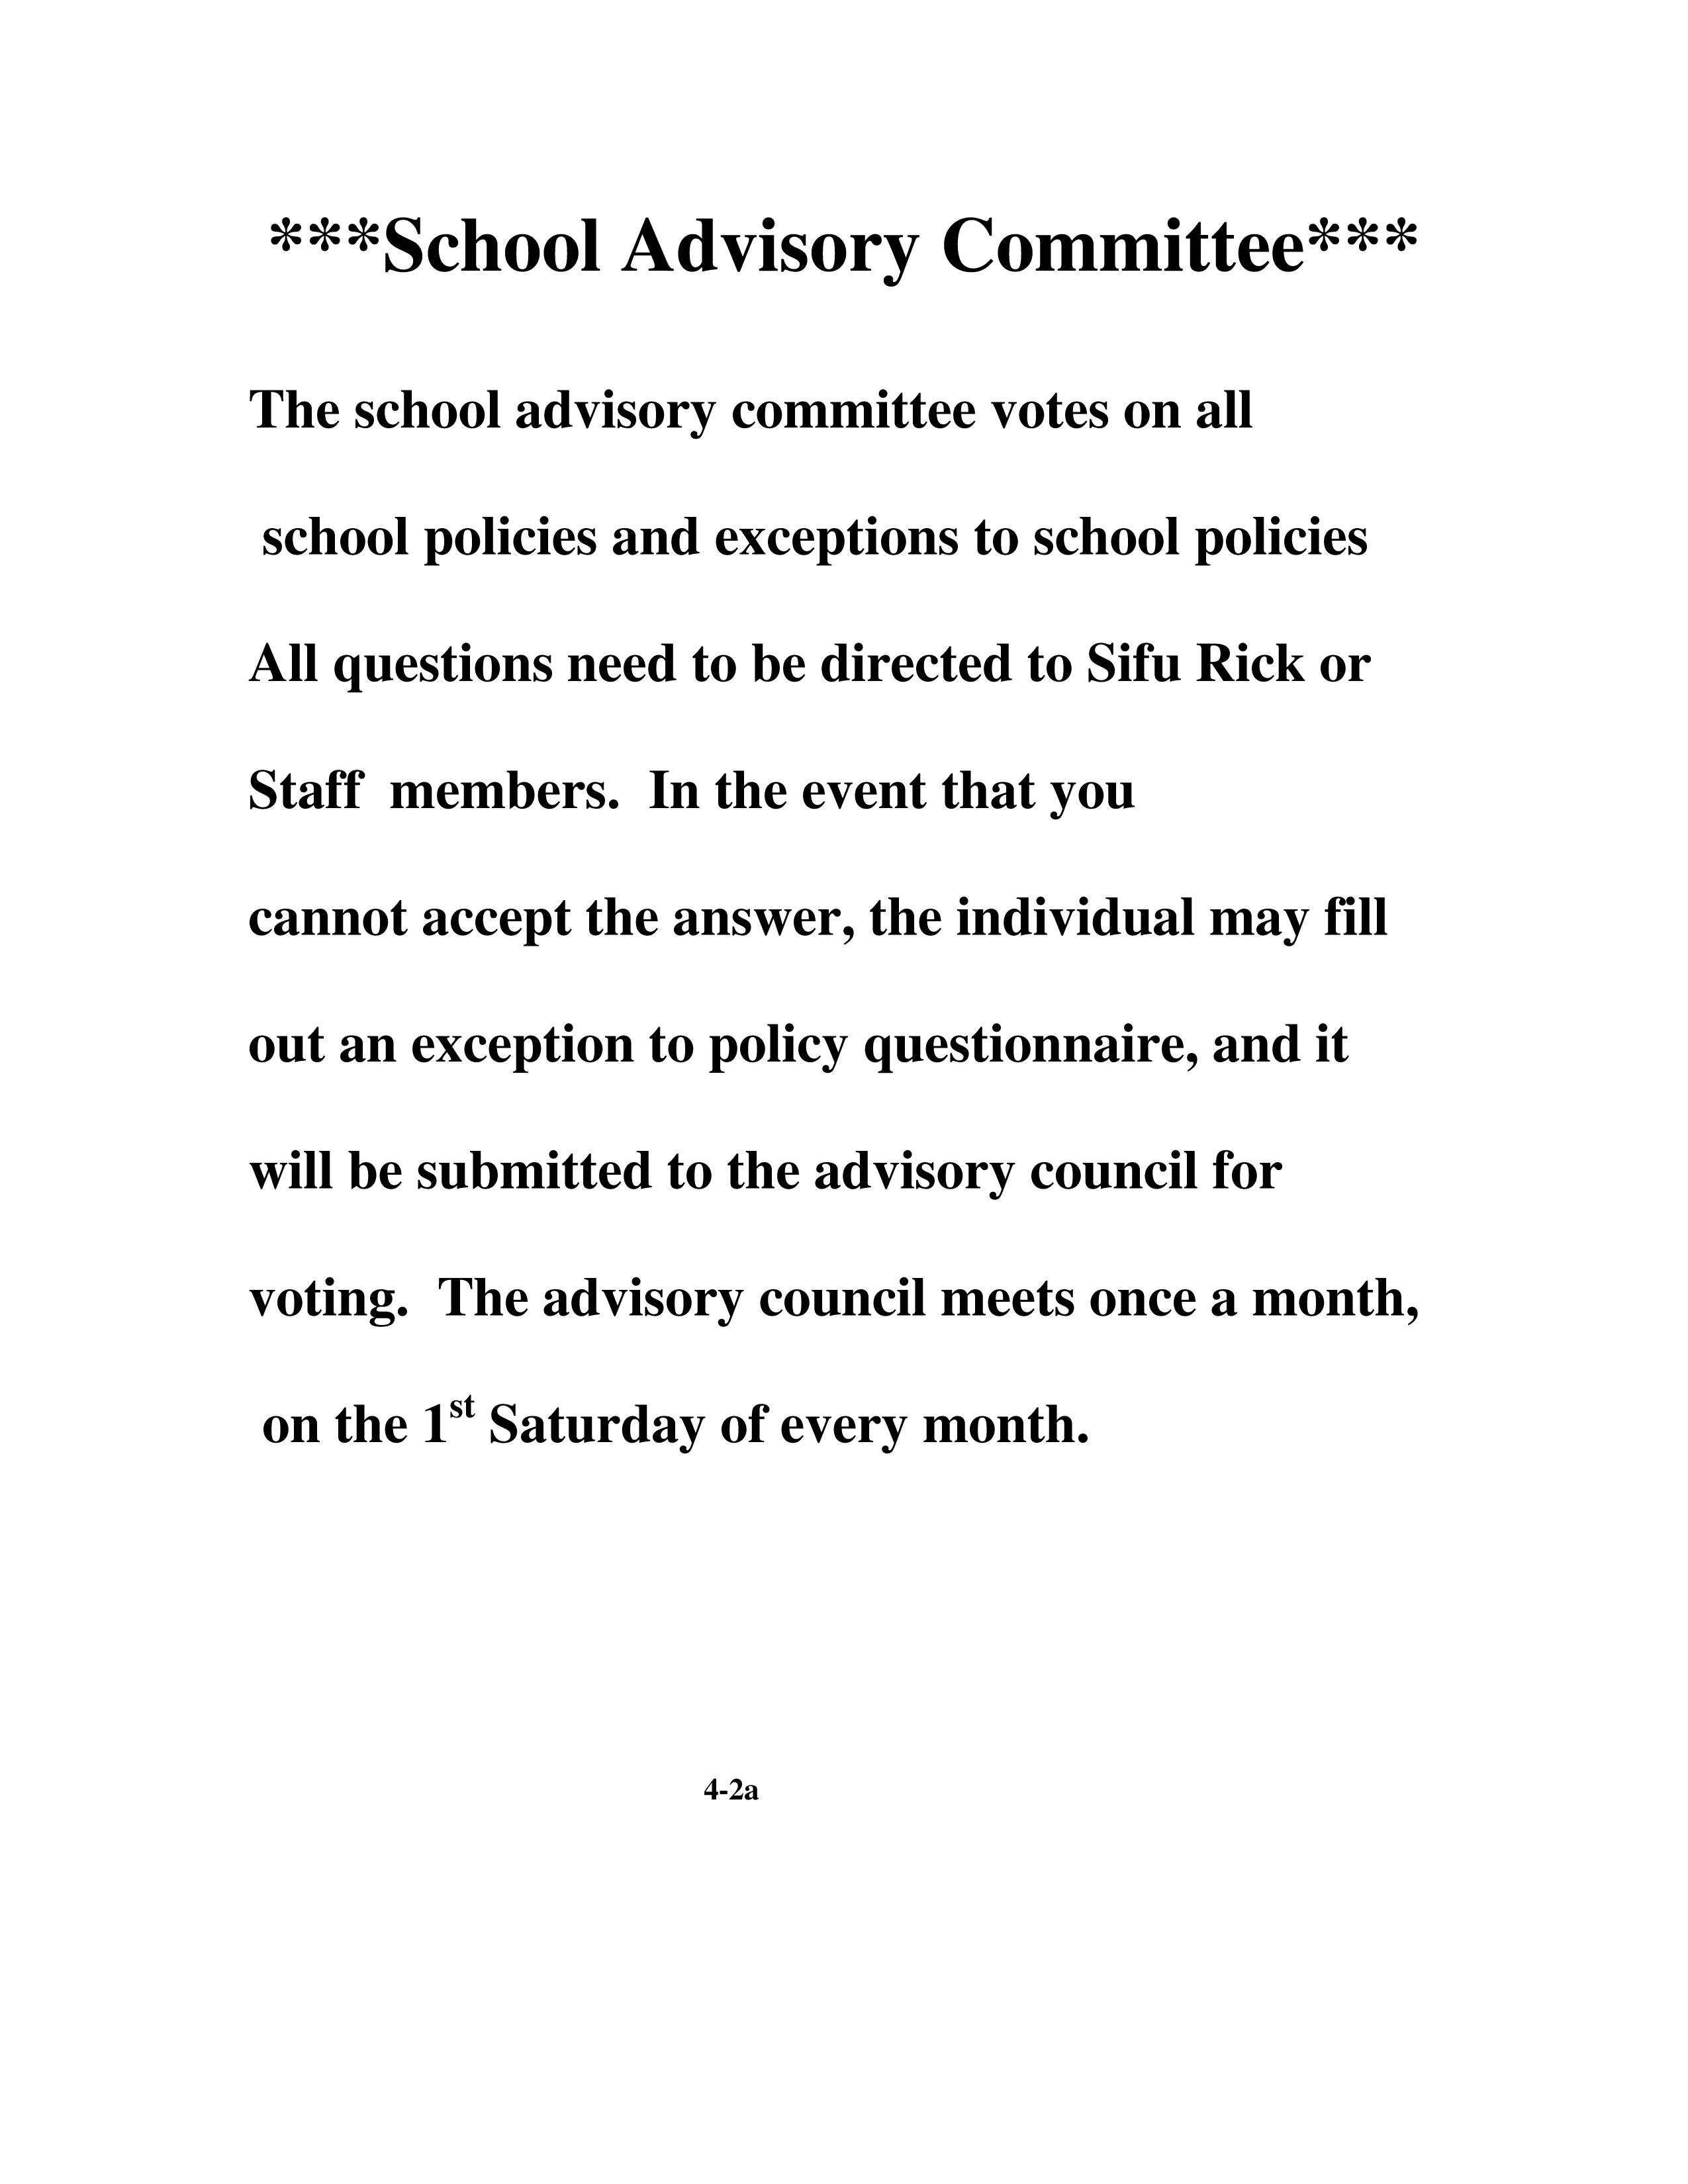 Microsoft Word - School Advisory Committee.doc